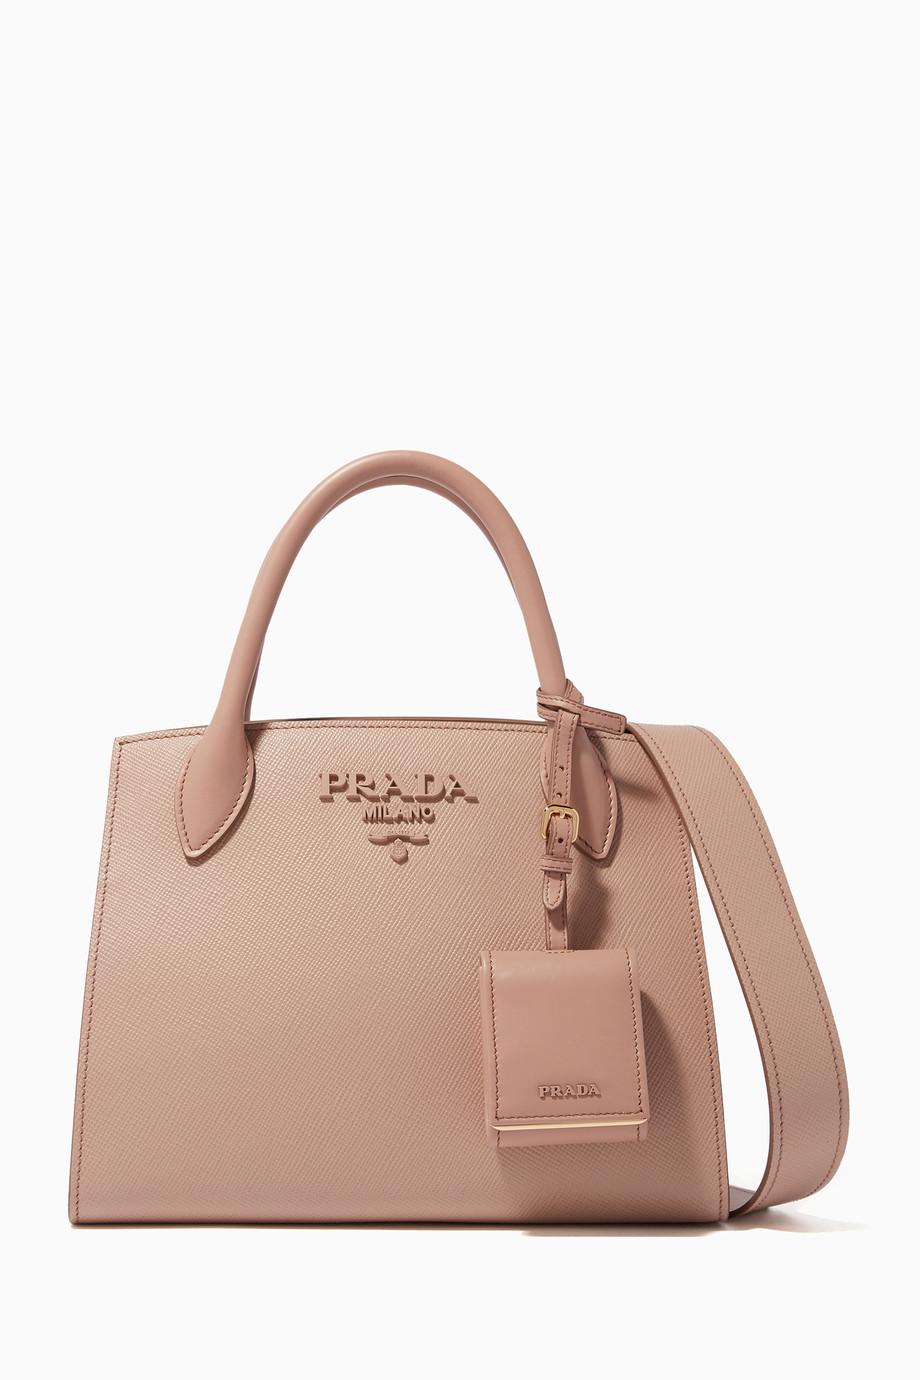 c42d51ae7ff8 Shop Prada Pink Rose Small Monochrome Tote Bag for Women